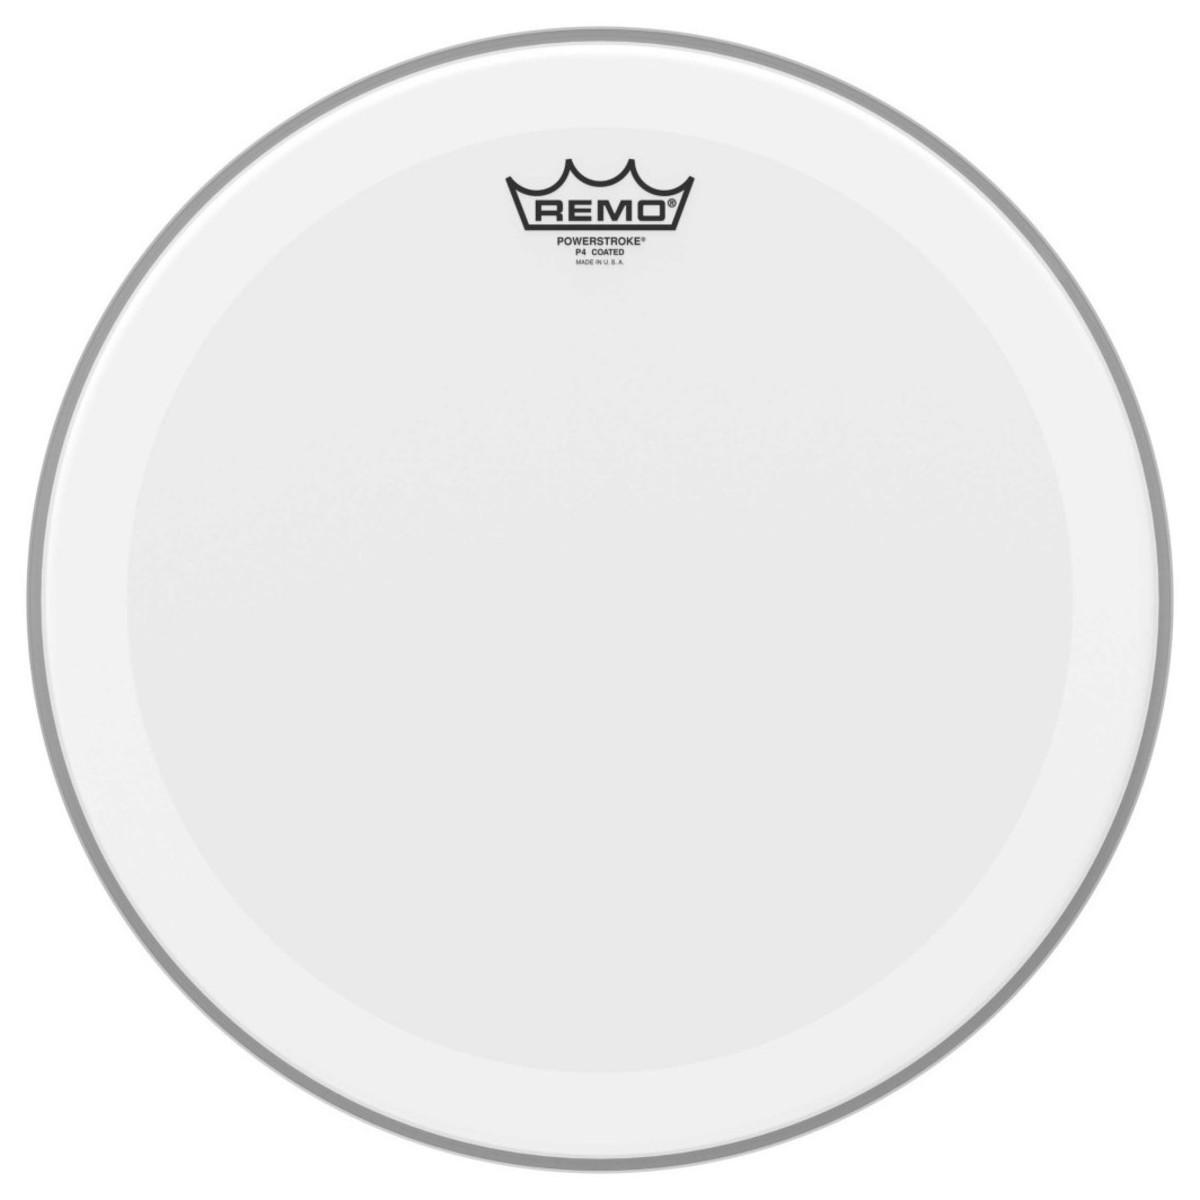 Remo Powerstroke 4 Coated 10 Drum Head